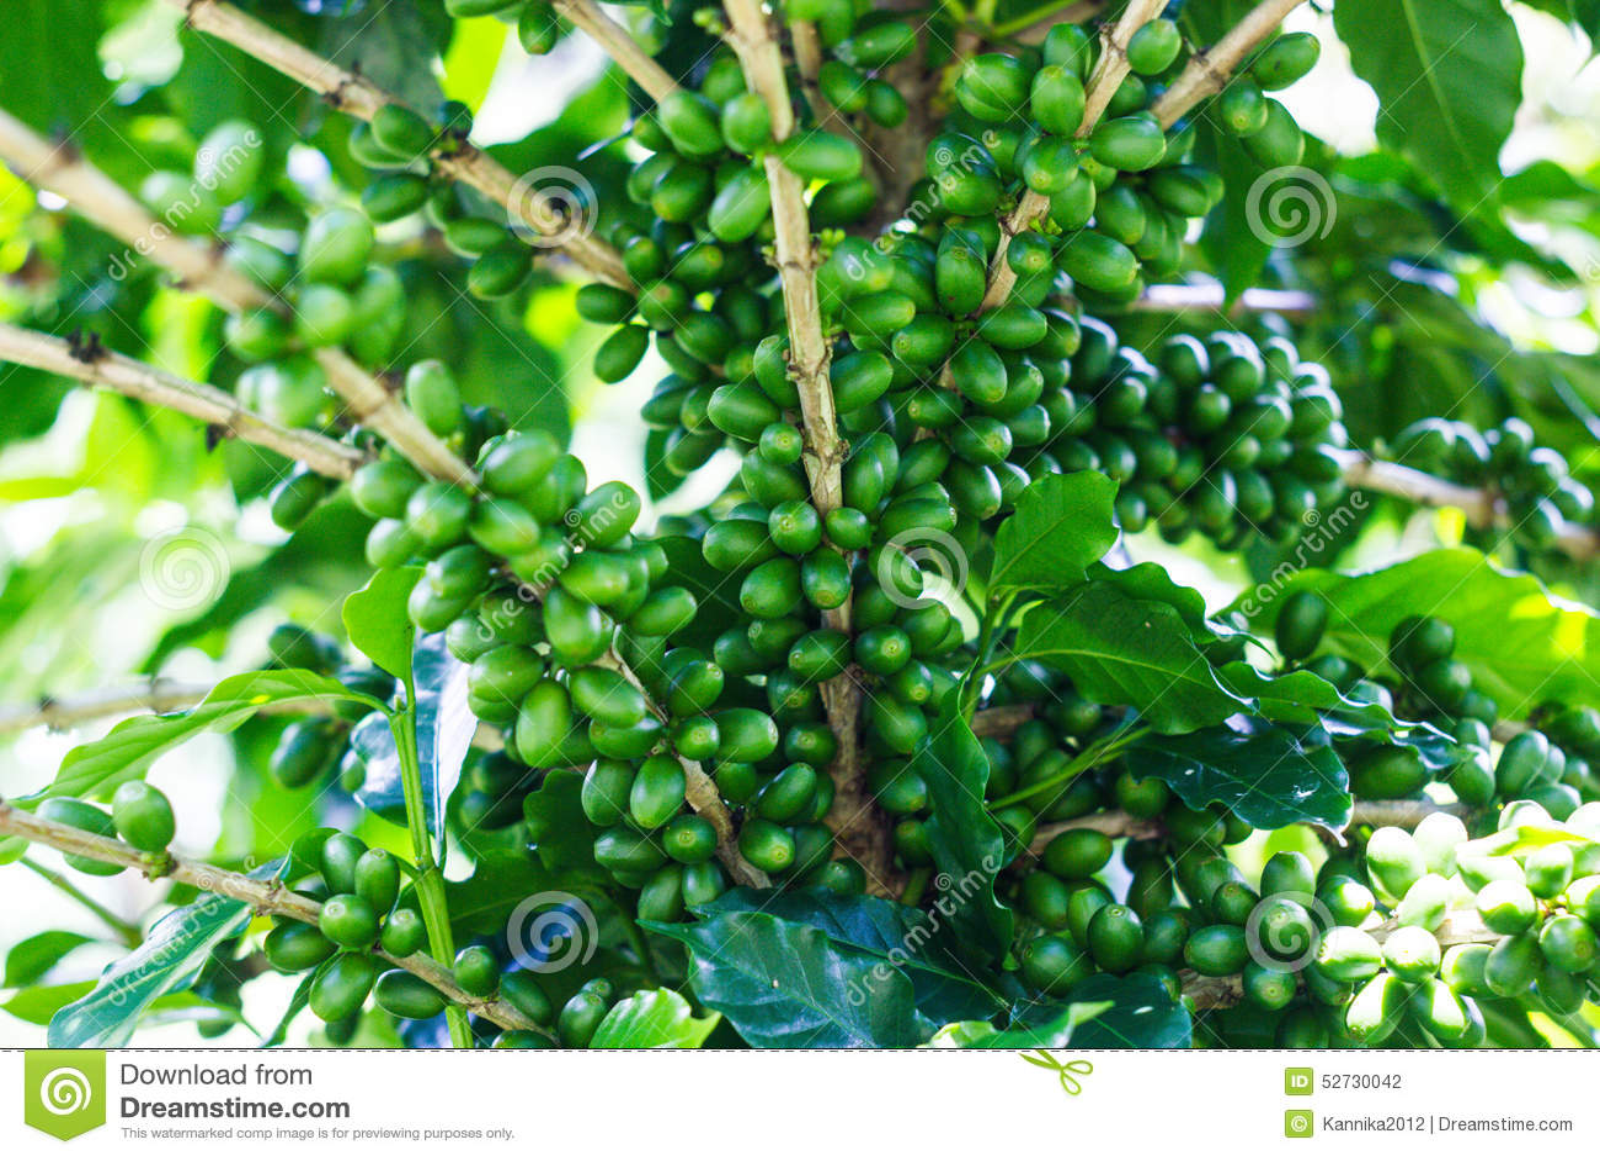 green coffee 39 bean on tree stock photo image 52730042. Black Bedroom Furniture Sets. Home Design Ideas